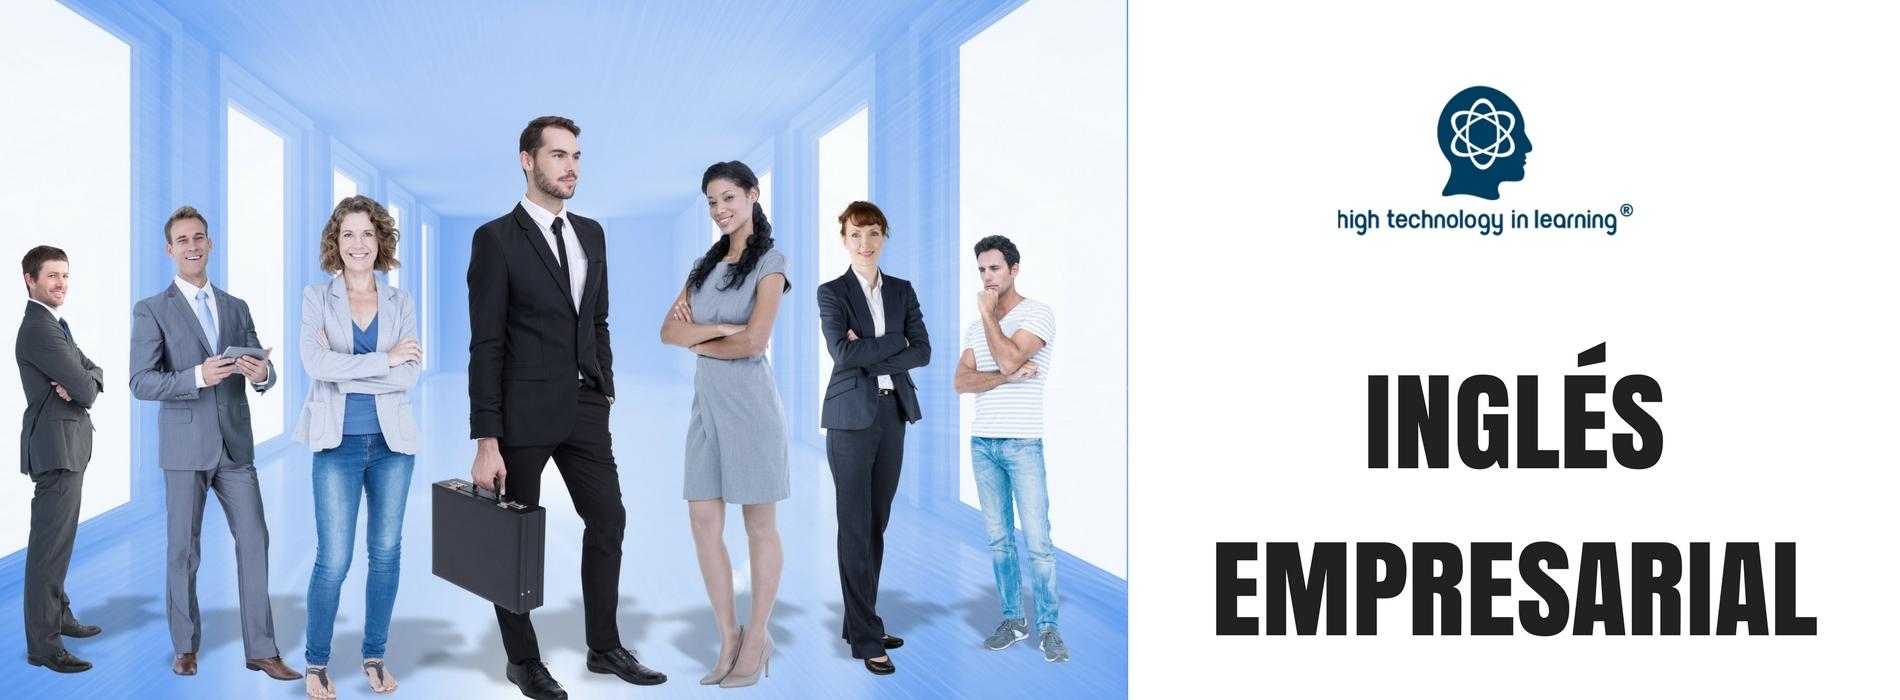 Ingles empresarial